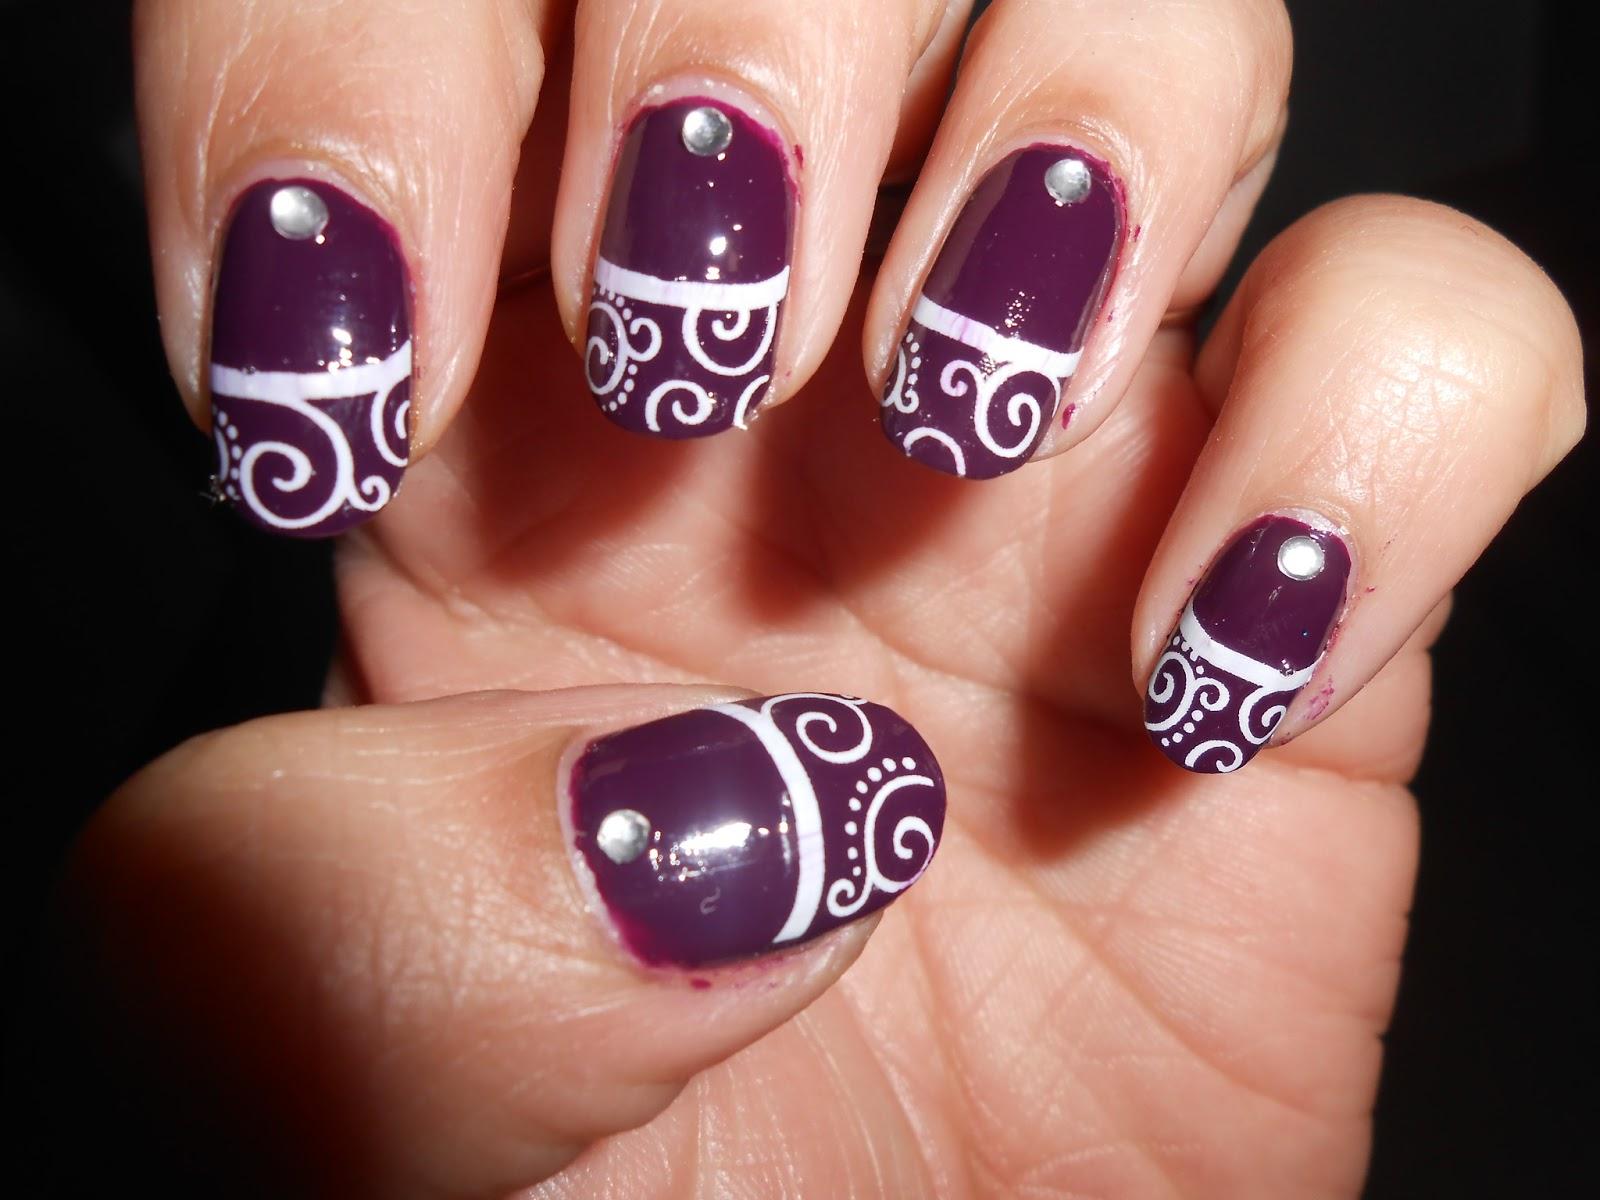 Cute Nails Beautiful Swirl Nails 2 Designs